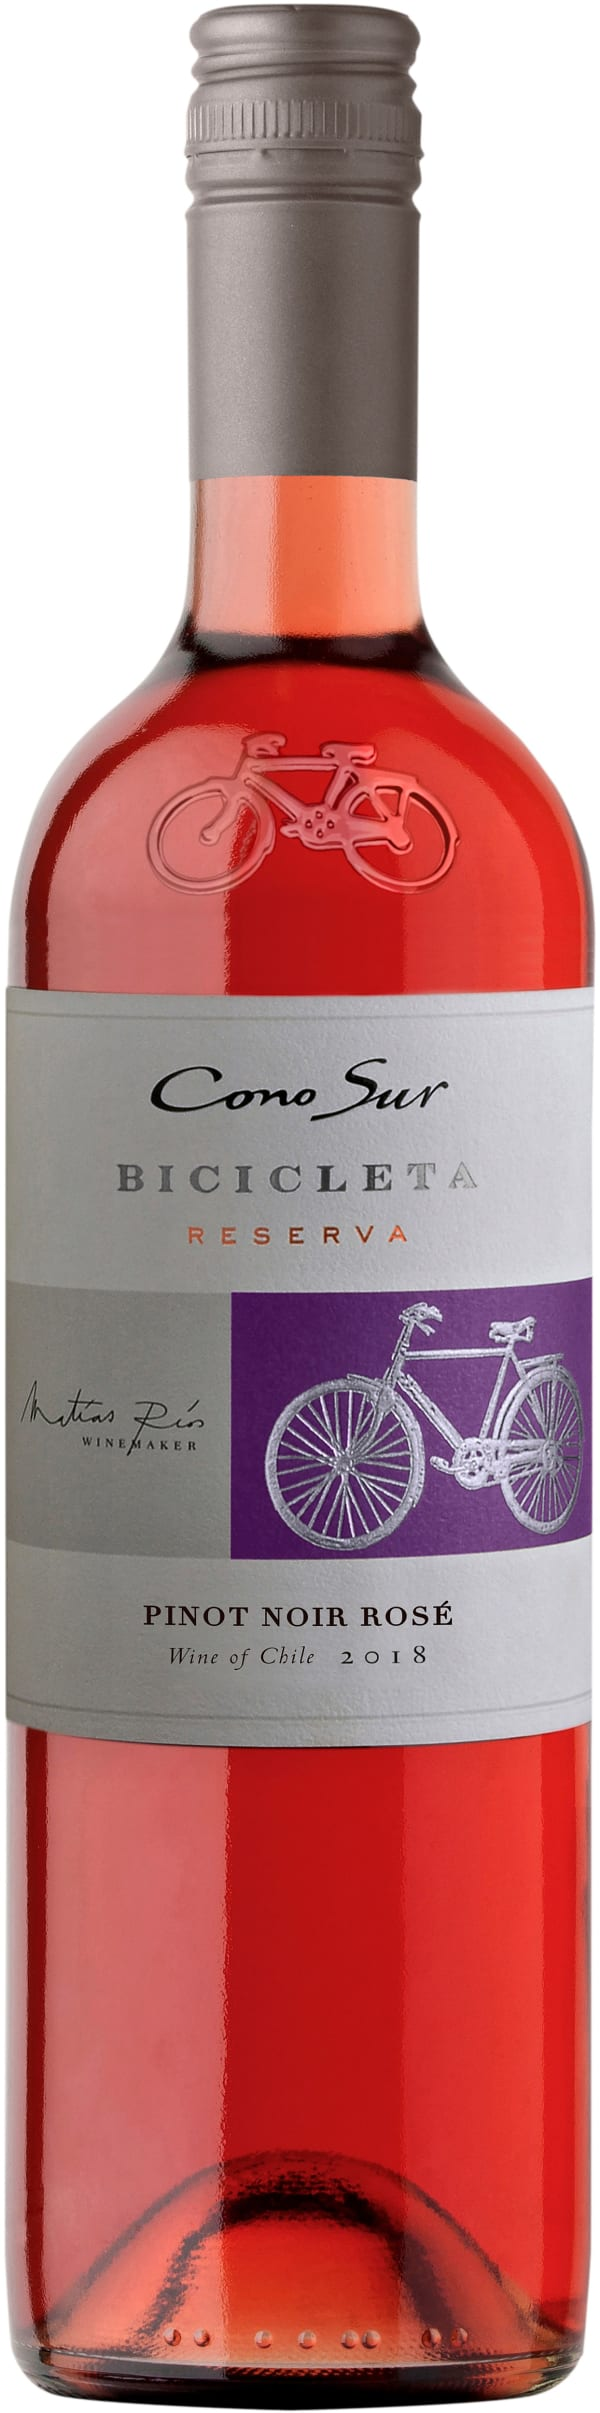 Cono Sur Bicicleta Pinot Noir Rosé 2018